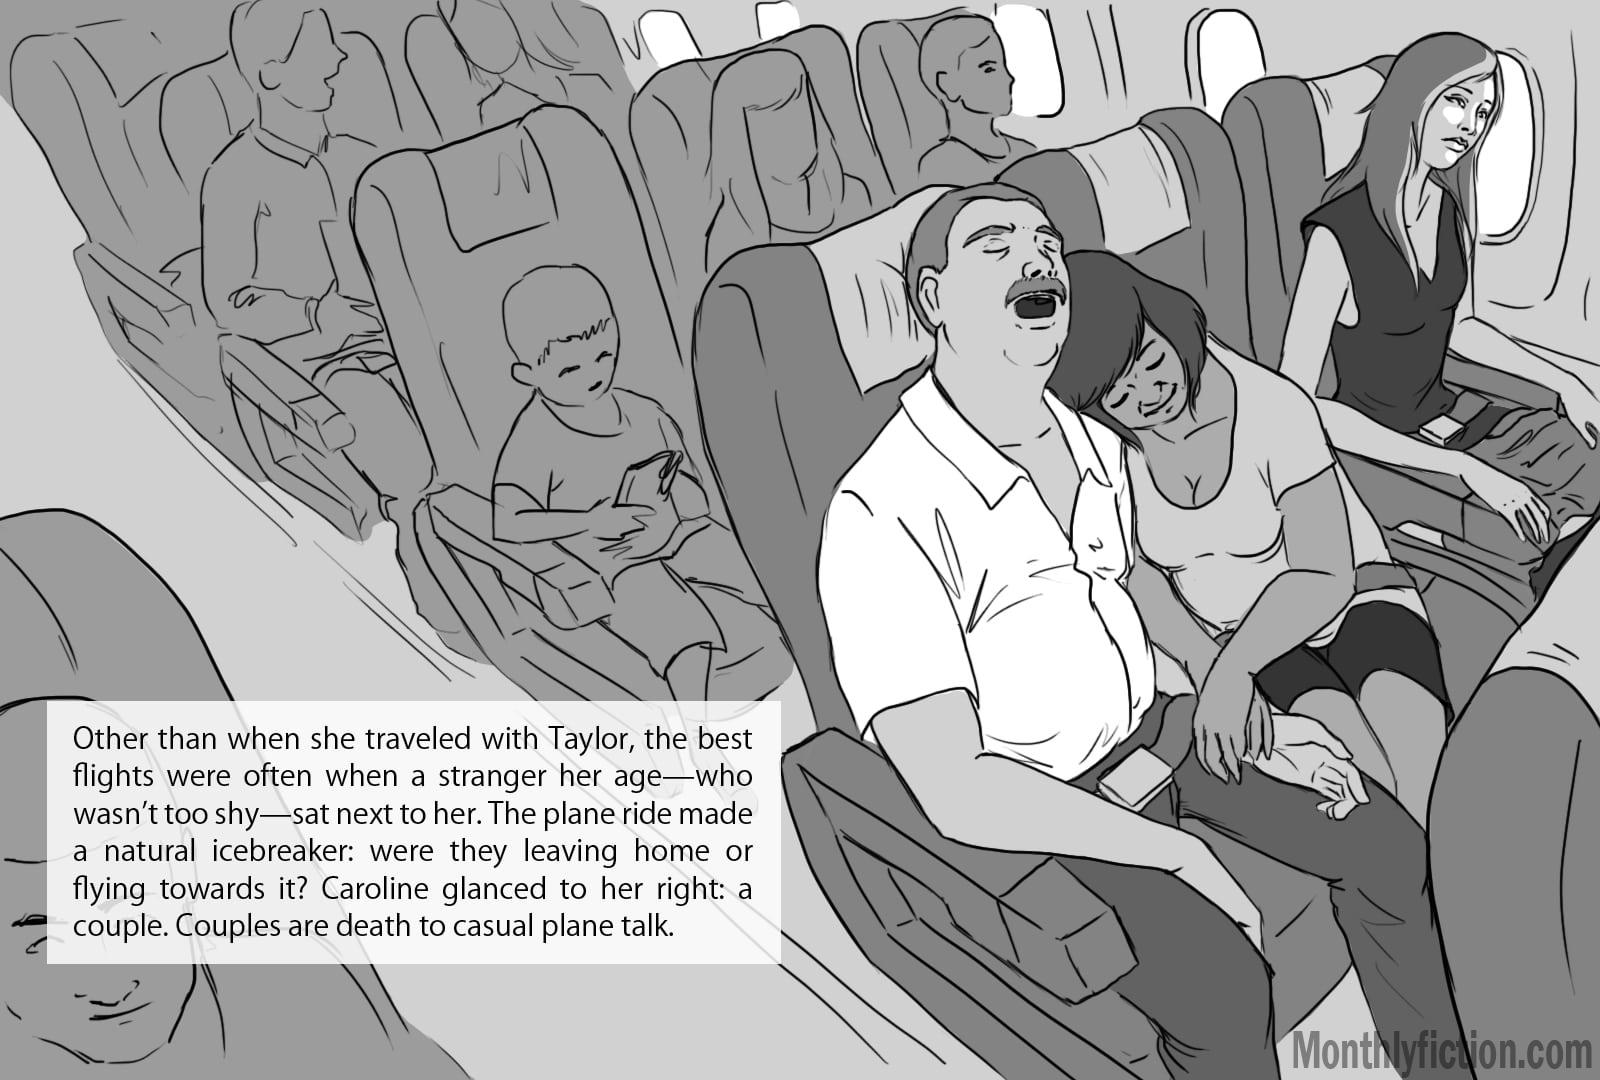 Monthly Fiction Takeoffs and landings illustration illustraded story deborah burke camilo sandoval page 6